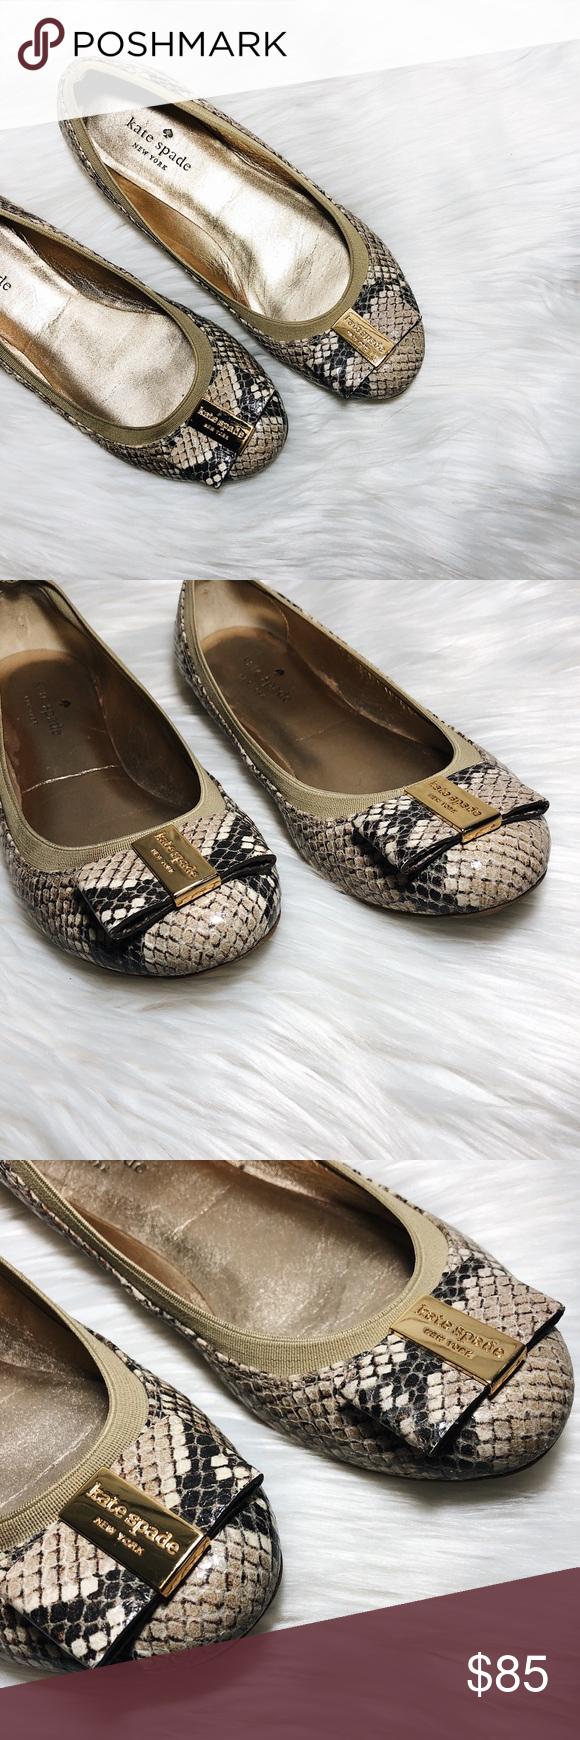 f3bfdb46302f Kate Spade Snake Print Bow Tock Flats Size 7 Kate Spade  Tock  ballerina  flats